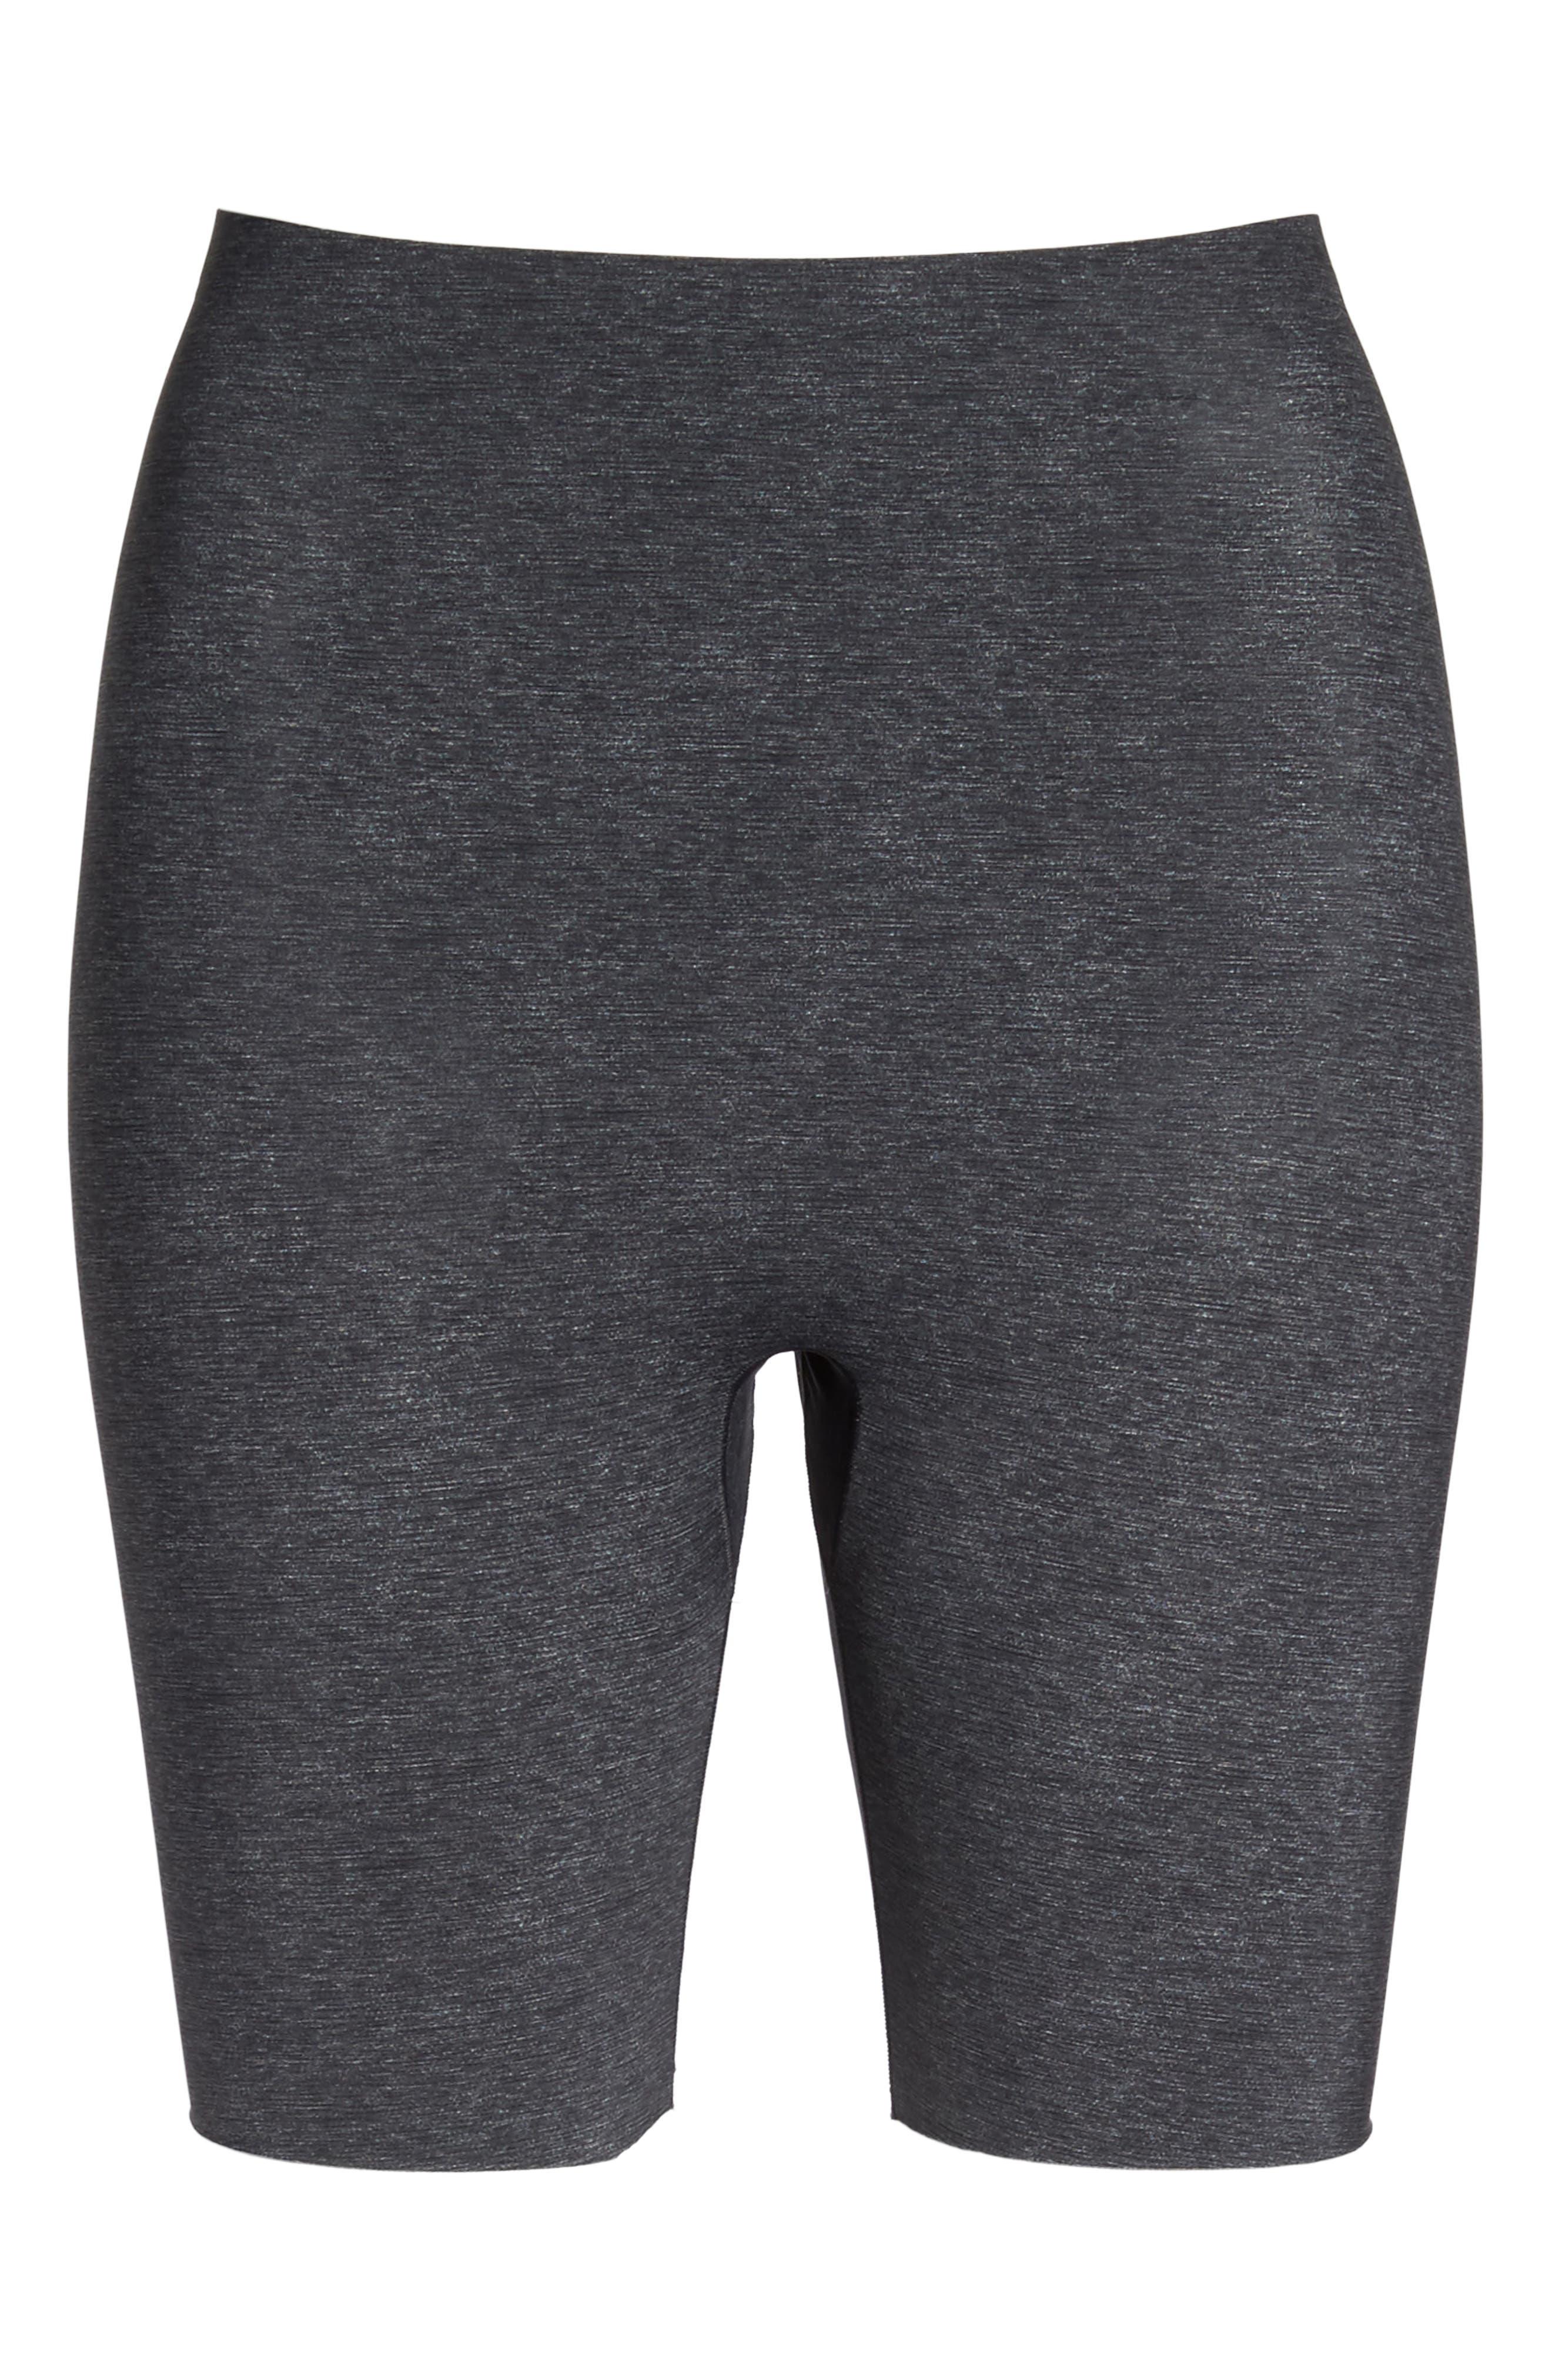 Alternate Image 4  - SPANX® Thinstincts Mid Thigh Shorts